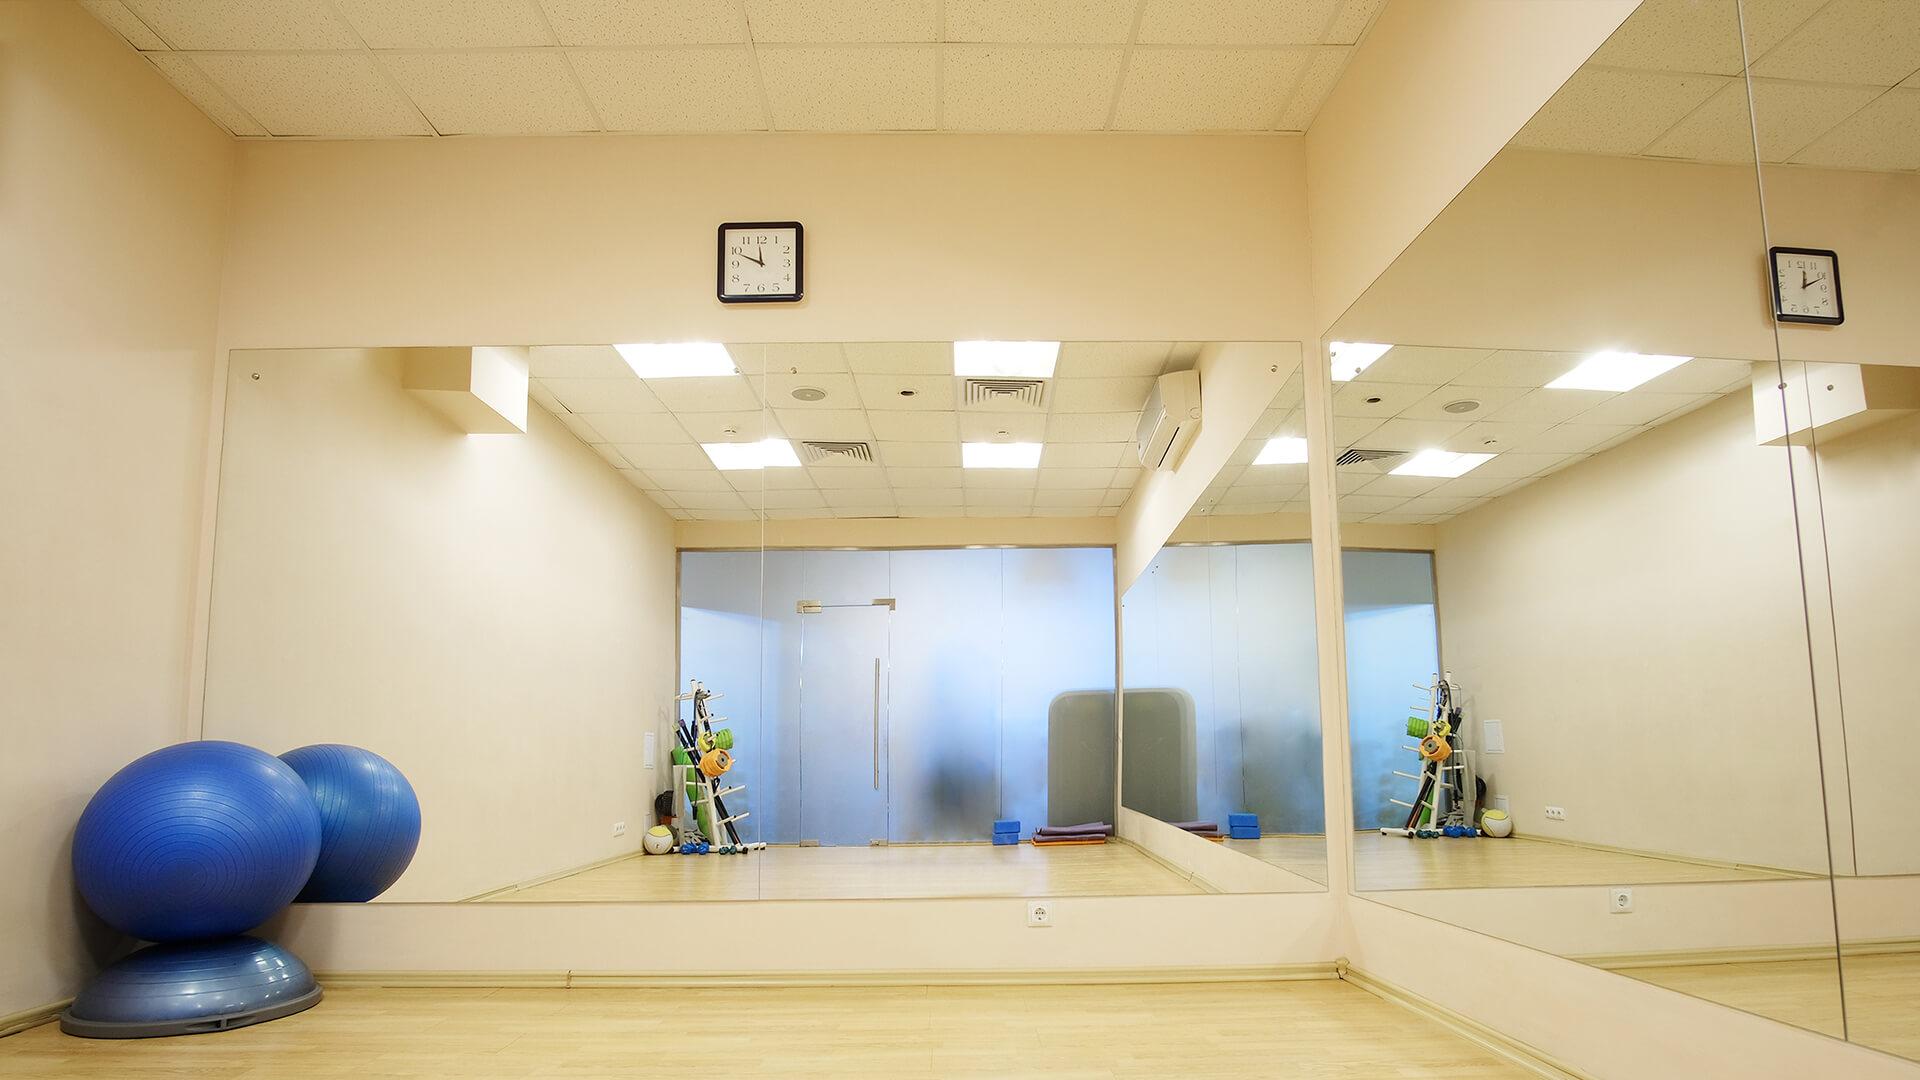 spor salonu aynalari imalati ve montaji - Spor Salonu Aynaları İmalatı ve Montajı